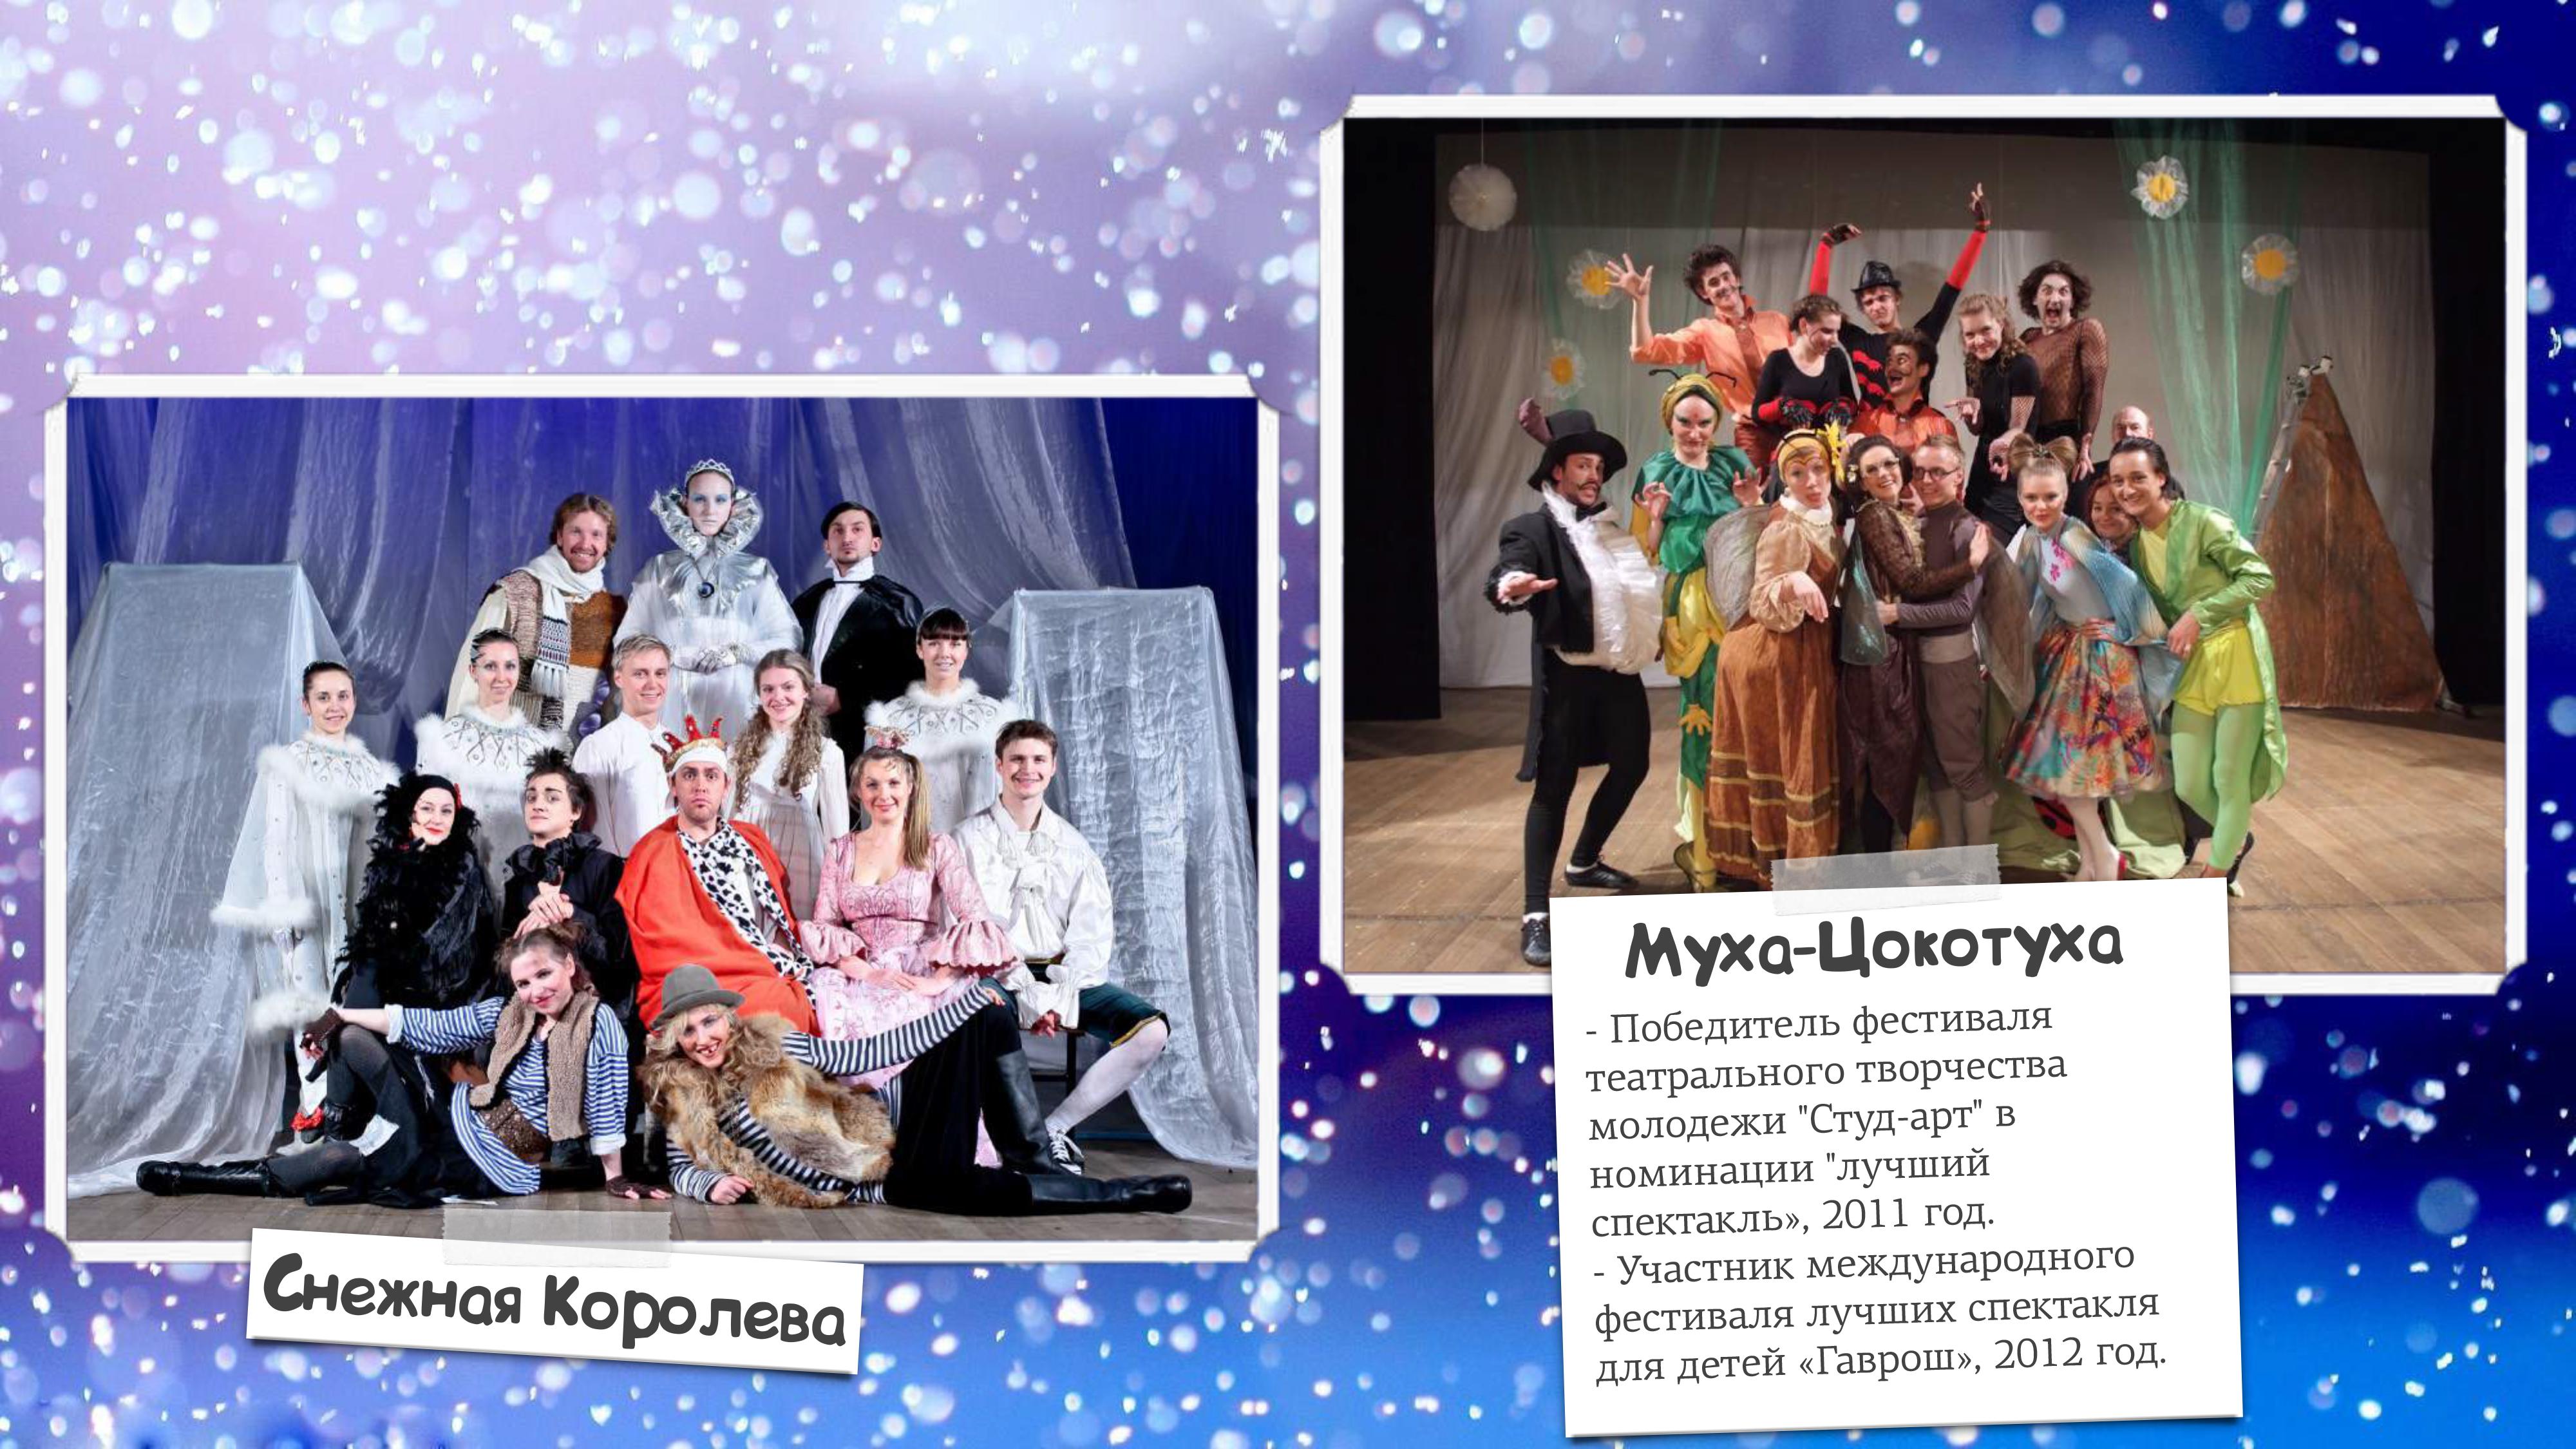 Spektakl-Moroz-Ivanovich-7